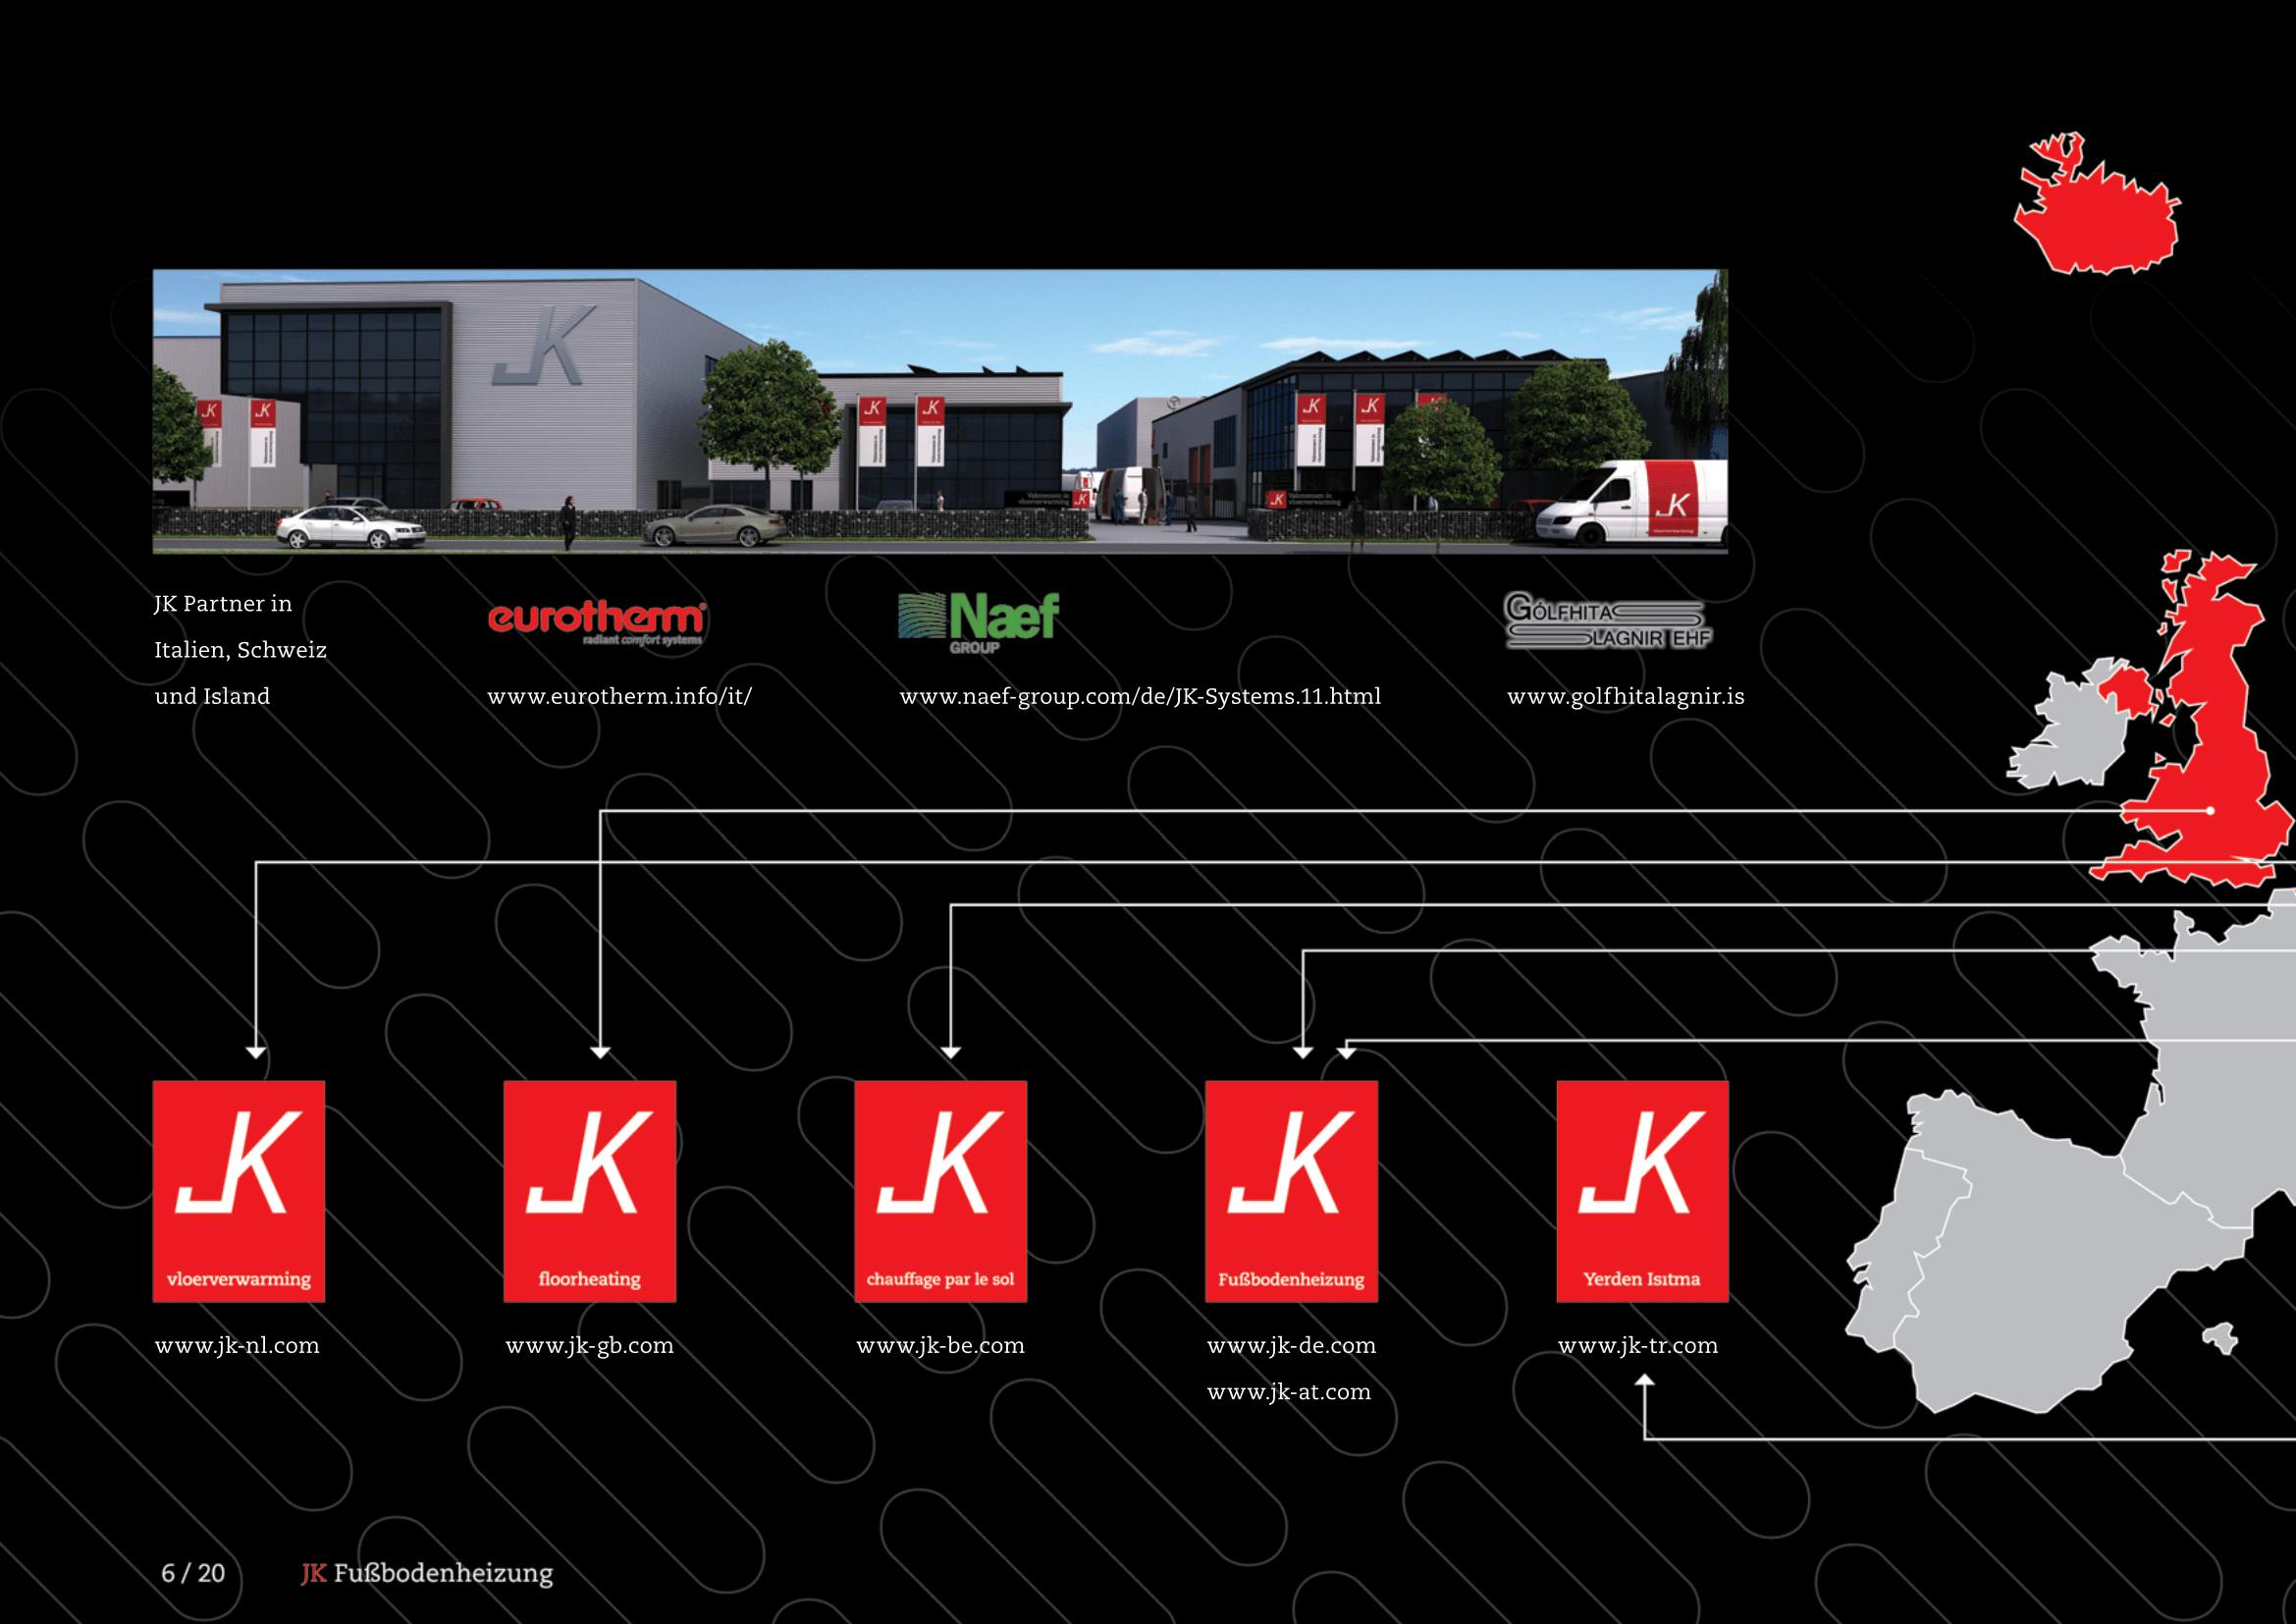 https://www.bonntech.de/wp-content/uploads/2018/02/JK-Beursbrochure-2016-Web_Page_6.png